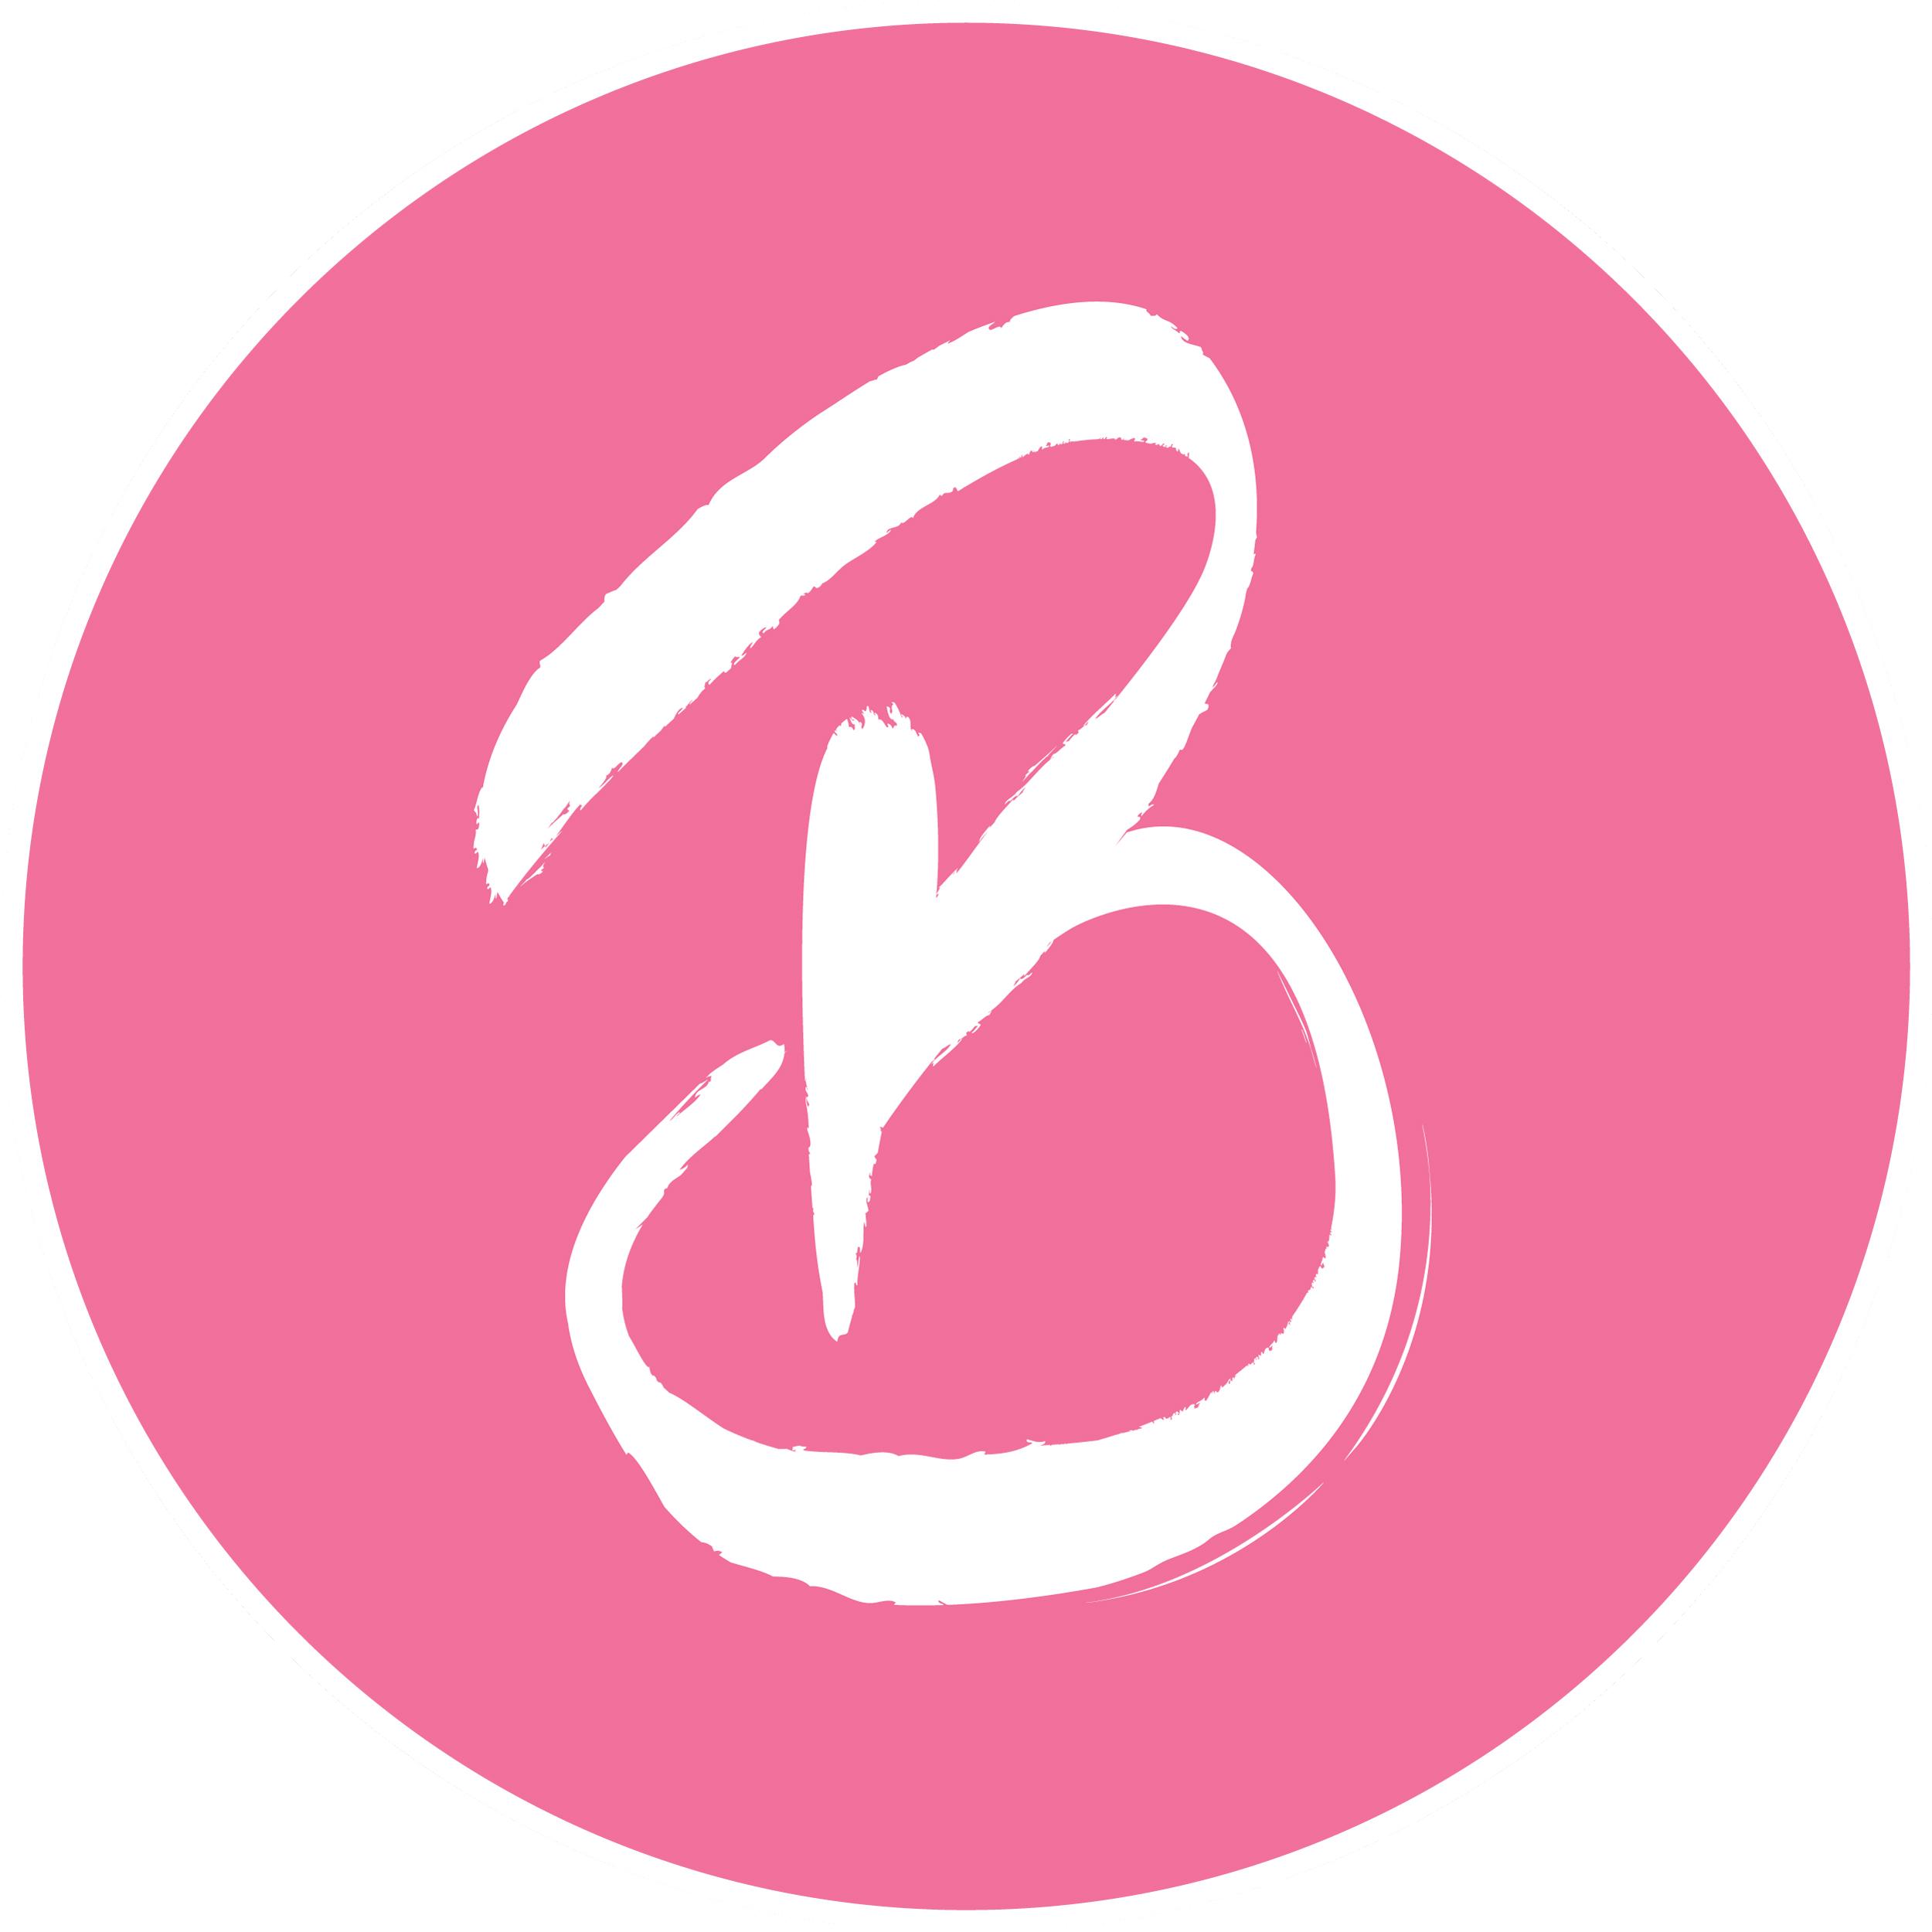 B-logo-large.jpg